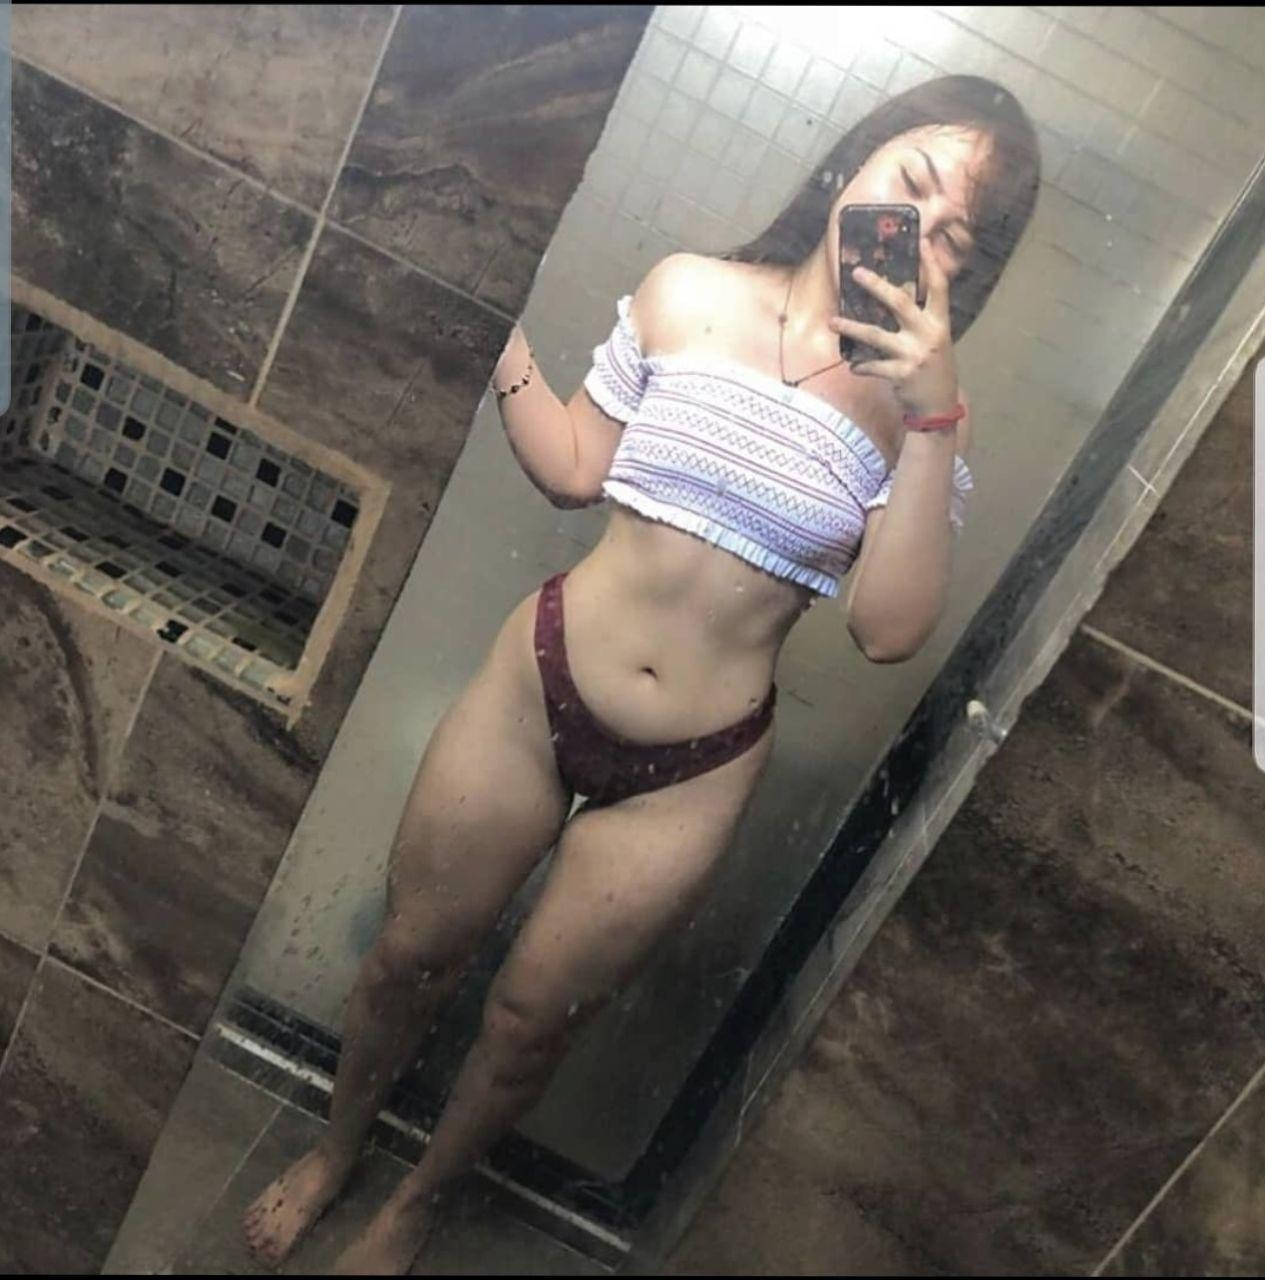 Pack de chica fitness full nudes + facebook 11